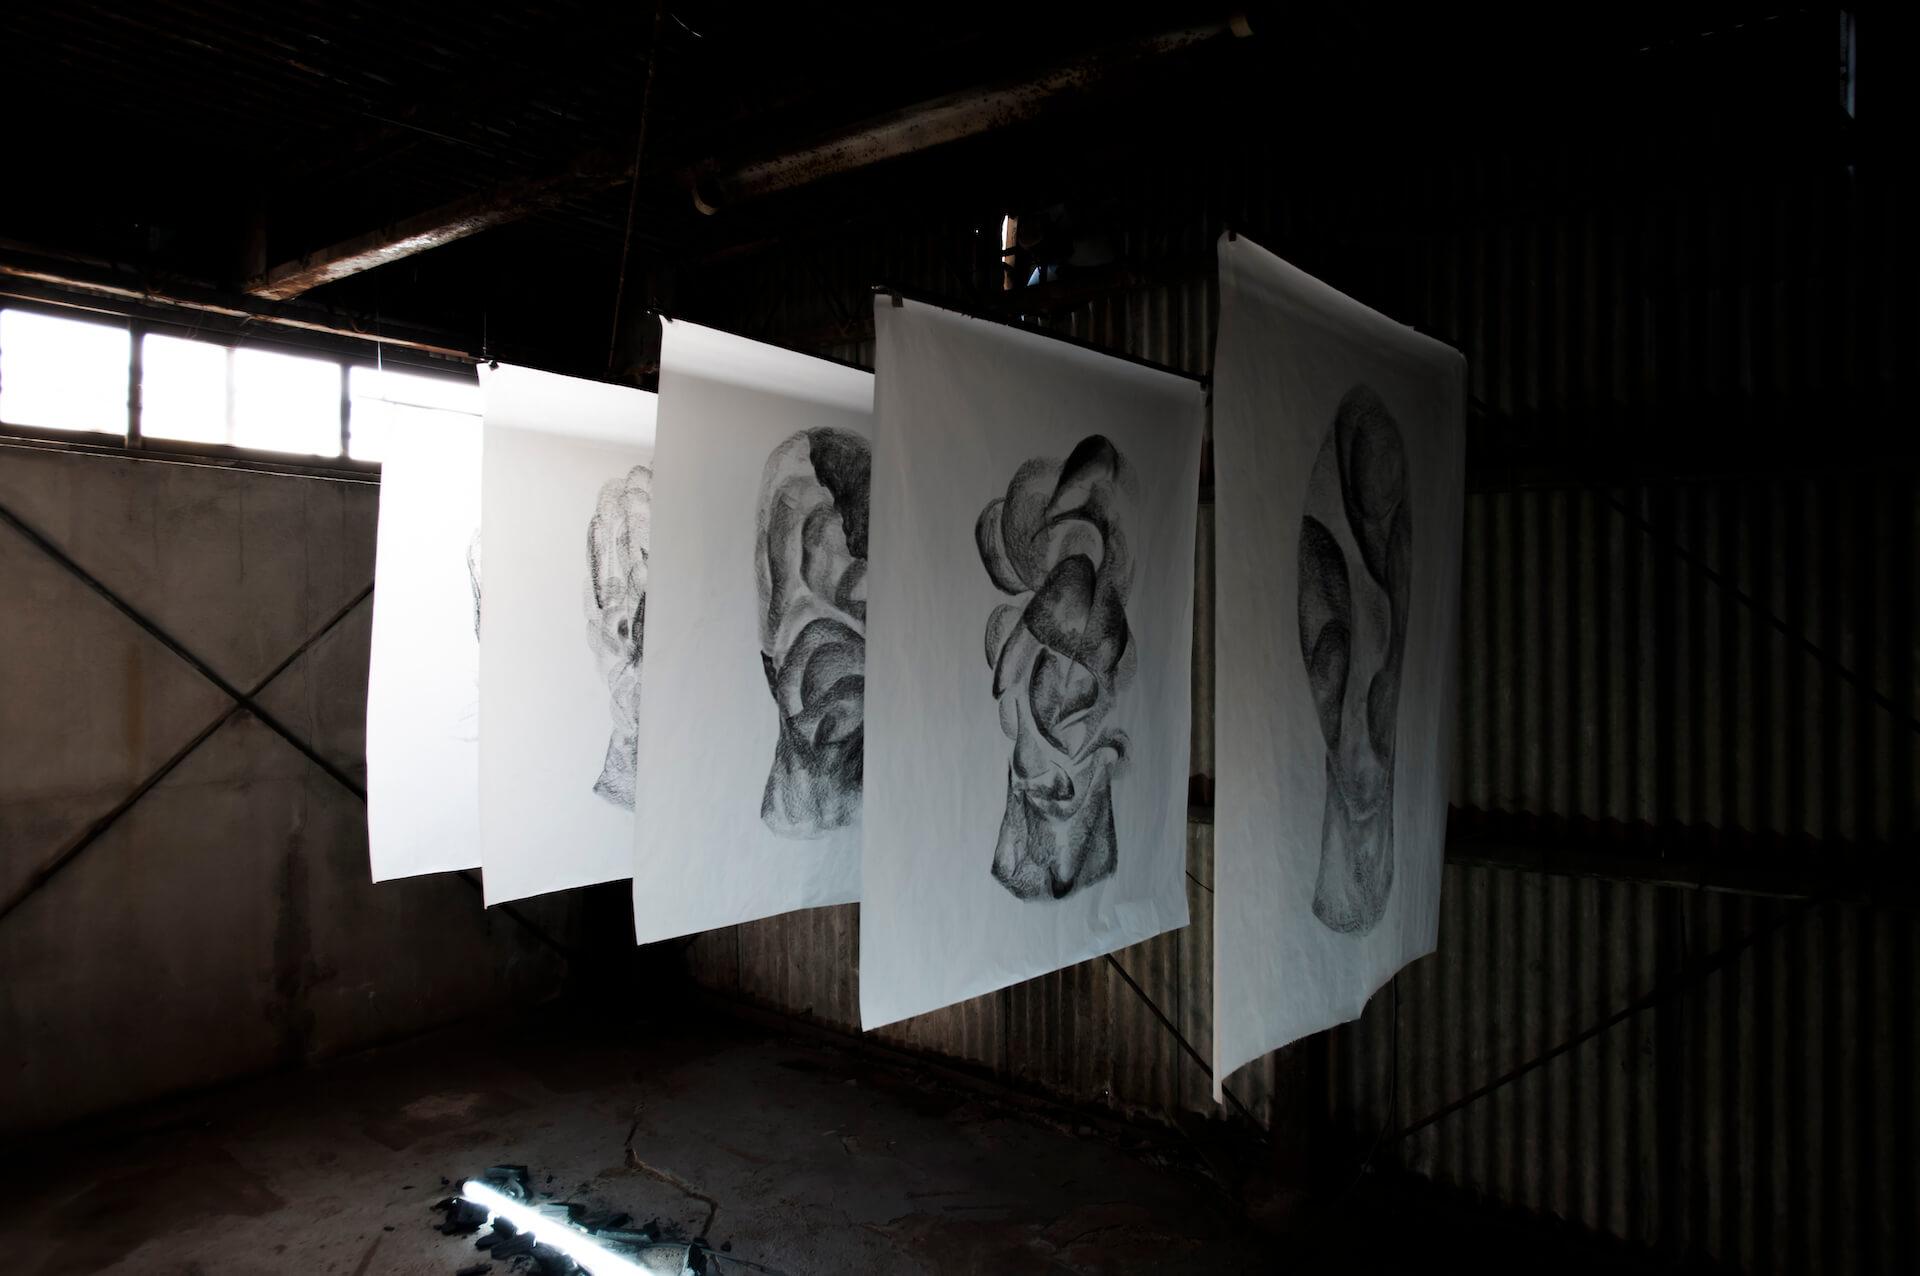 UC EASTの東京初個展「MOTHER」がANAGRAにて開催 オープニングパーティには¥ØU$UK€ ¥UK1MAT$U、Akie、Celterが出演 art-culture201202-uceast-anagra-6